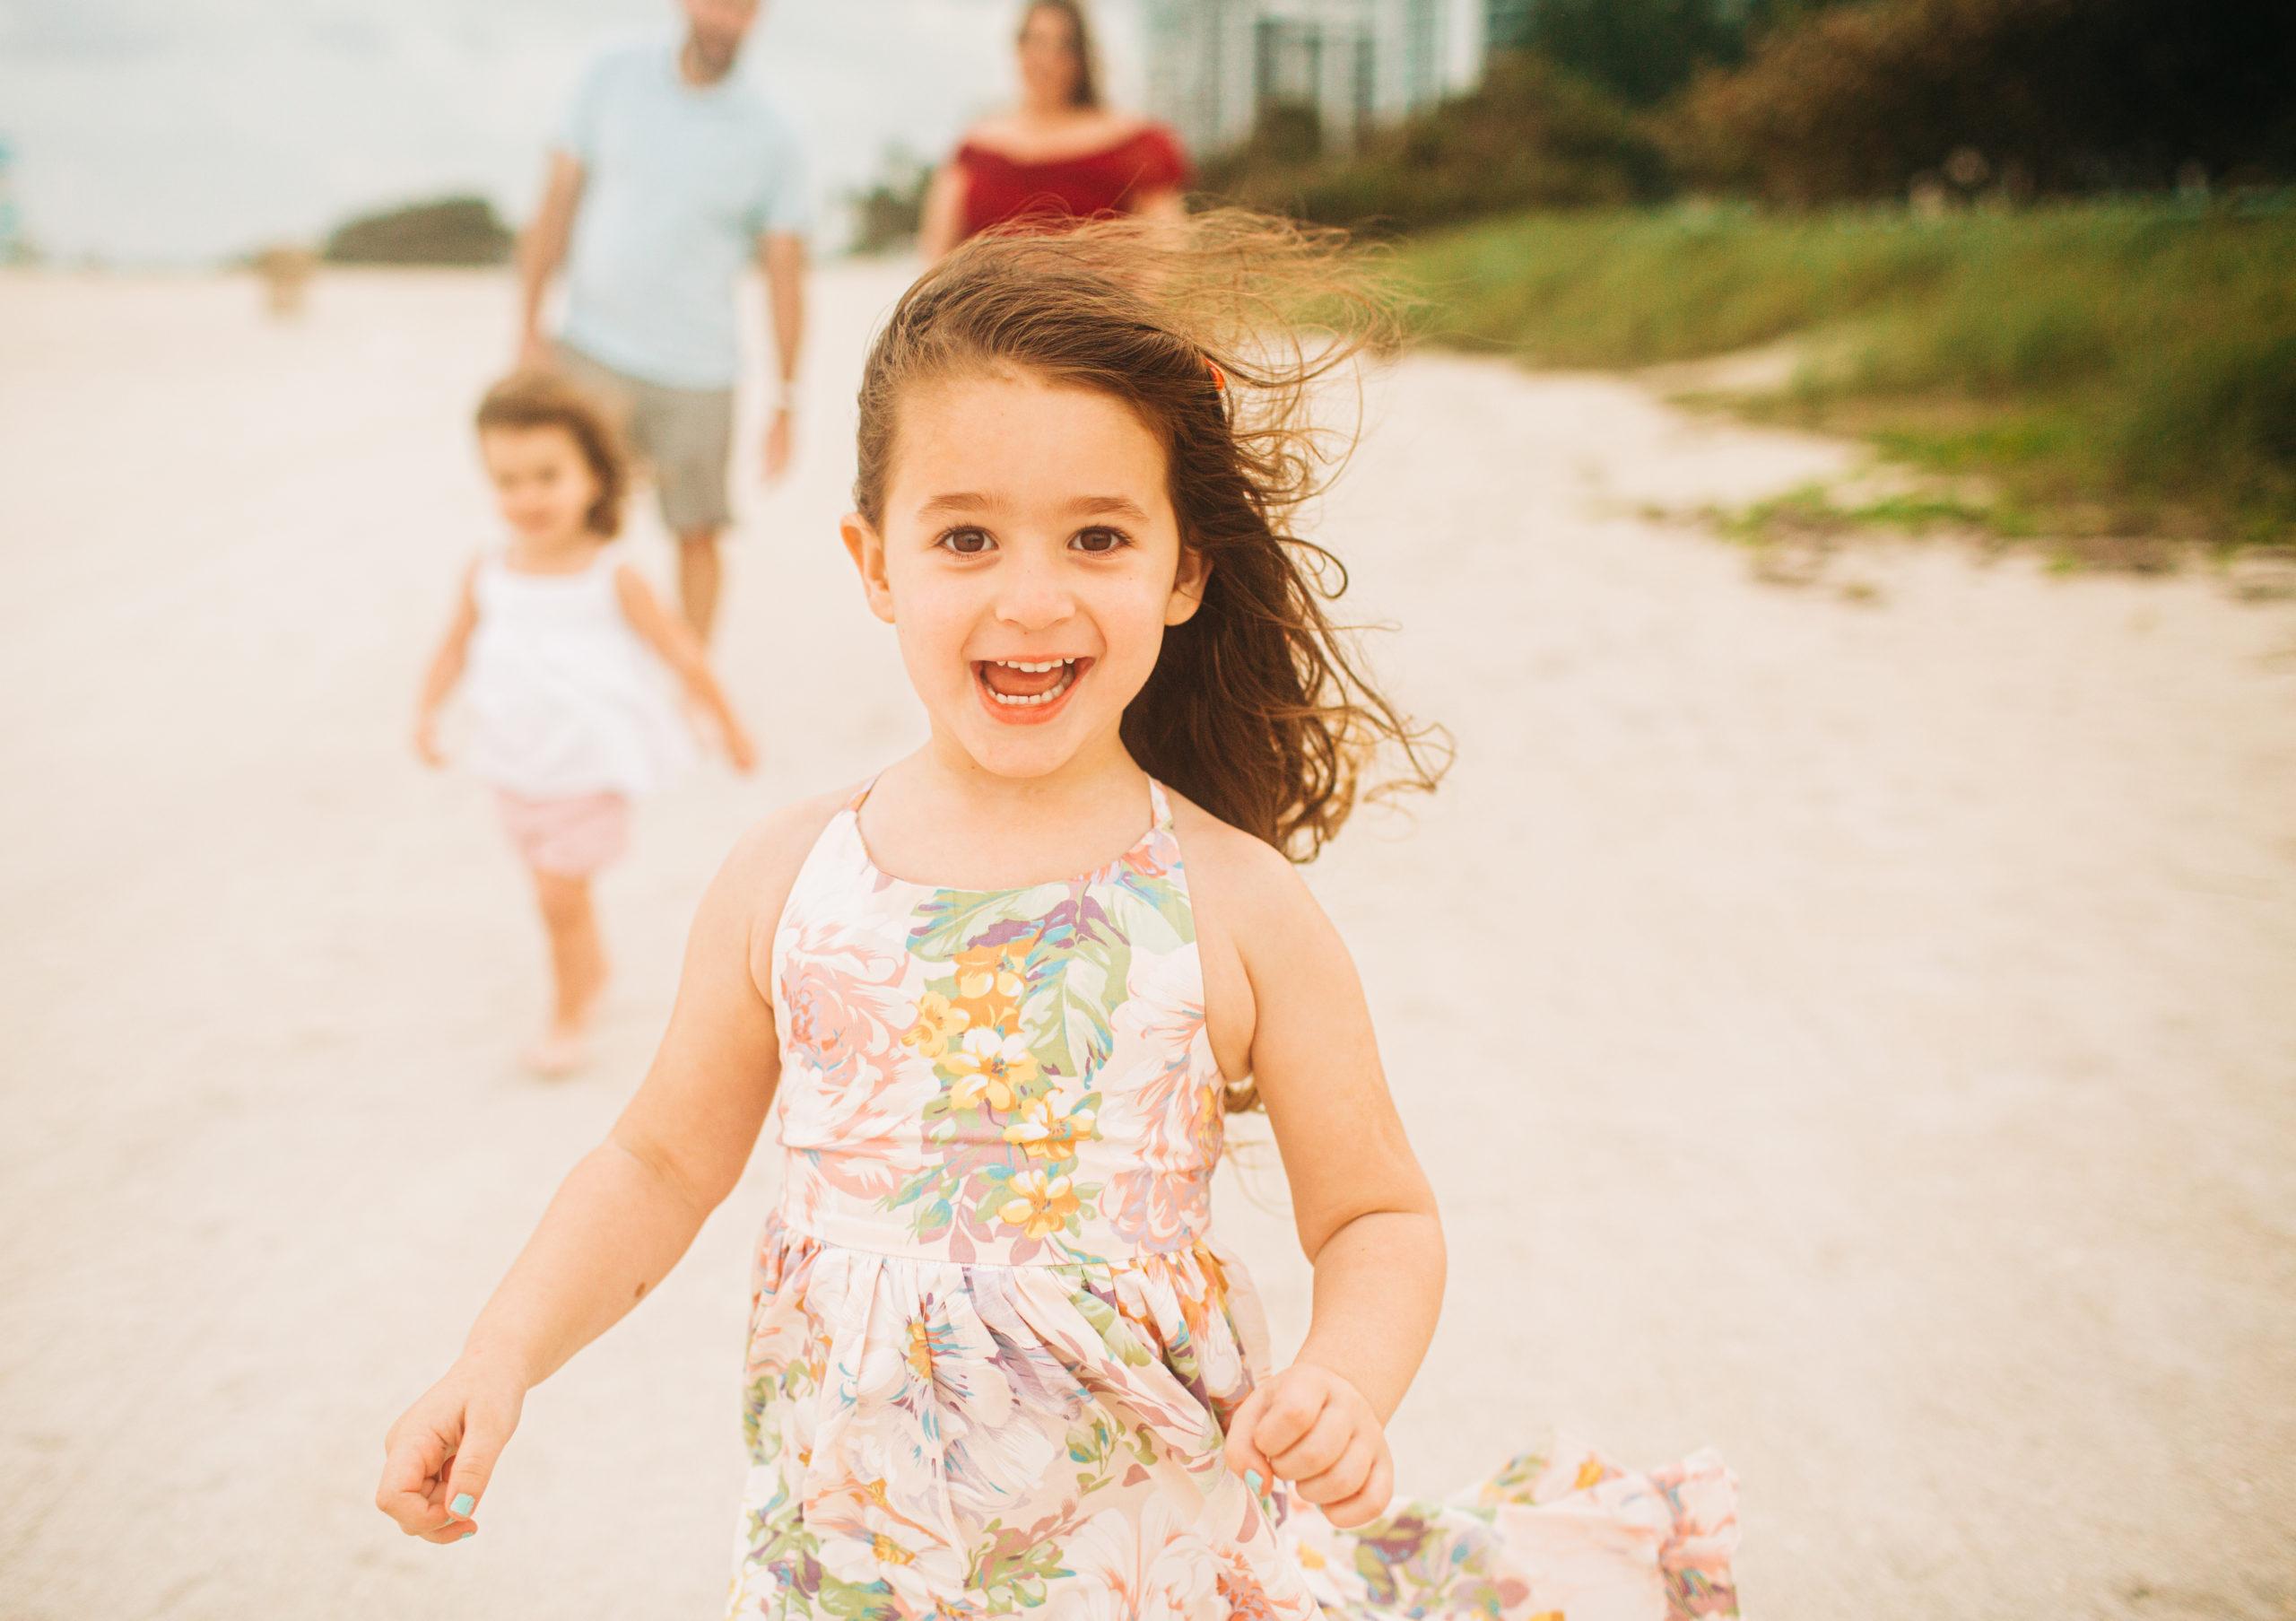 FamilySessionBeach_Alisa-41-scaled Miami's 8 best Photoshoot Locations